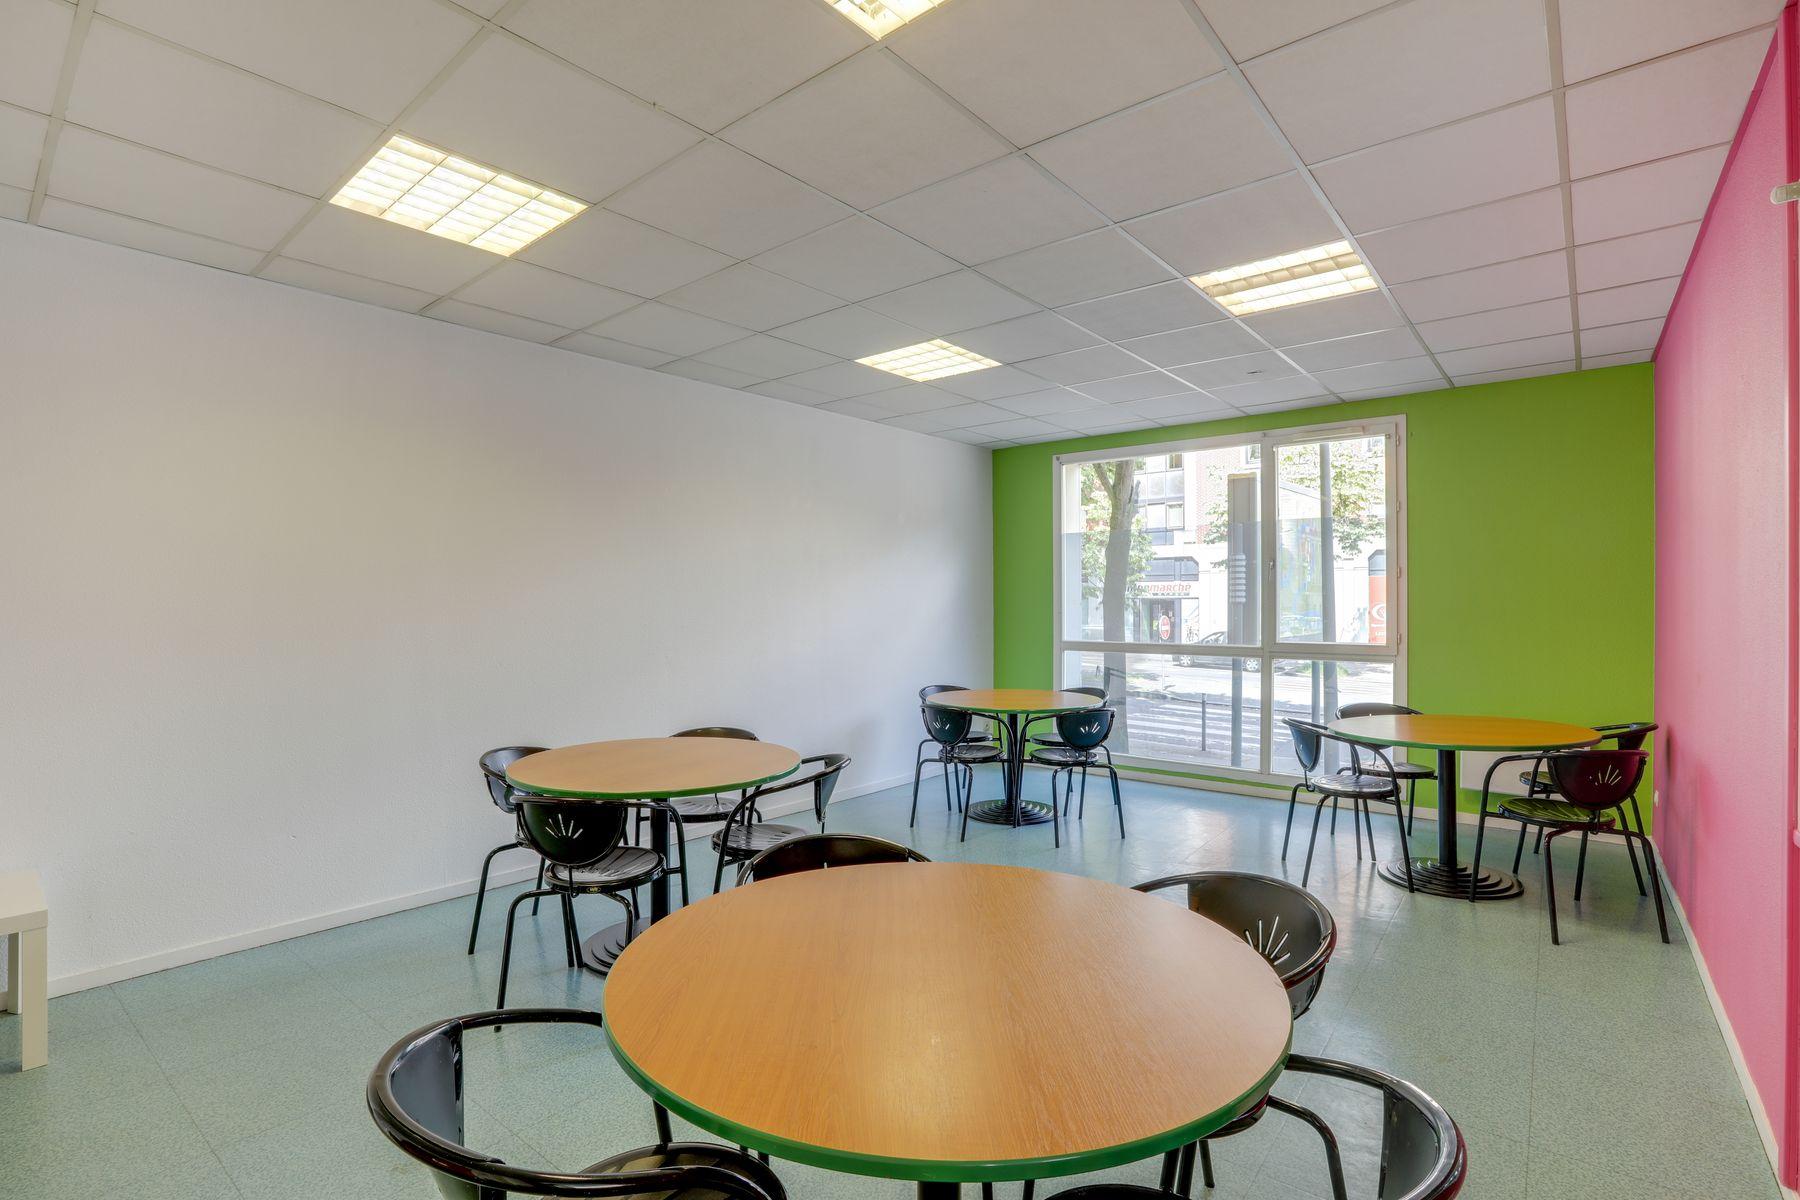 LOGIFAC résidence étudiante Gambetta Rouen salle de travail